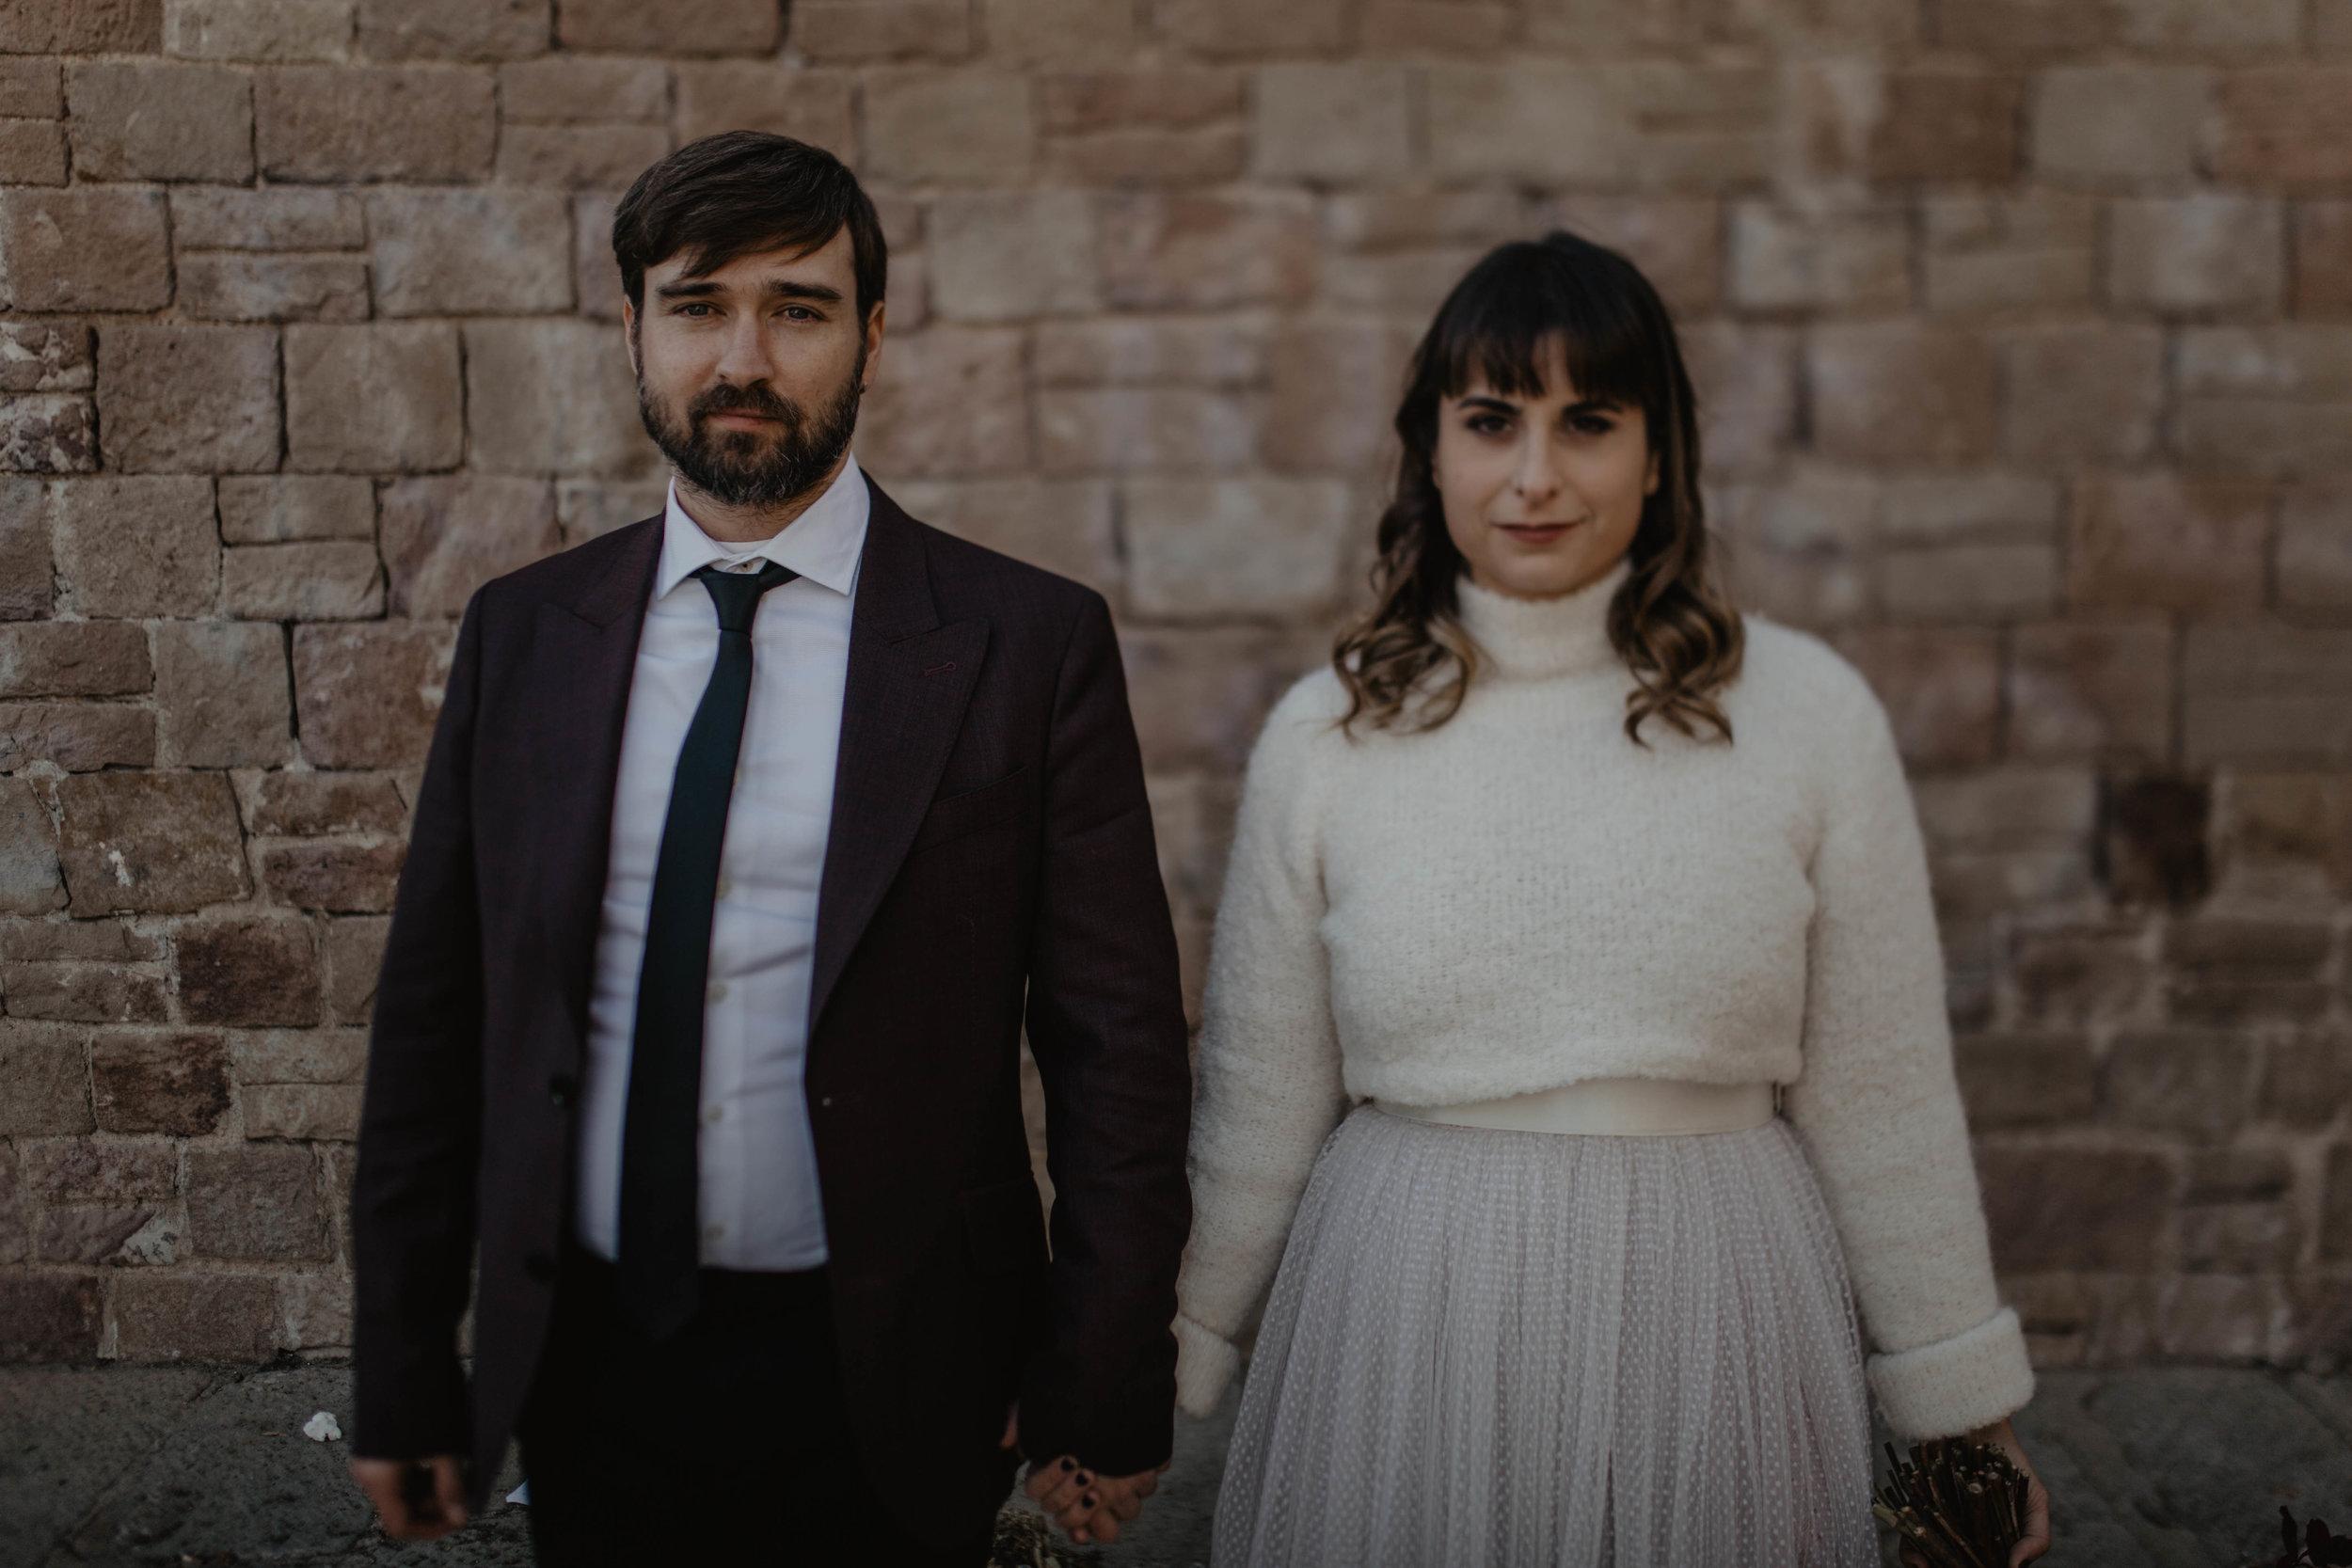 thenortherngirlphotography-photography-weddingphotography-couple-bodasconestilo-bodasenbarcelona-martadavid-368.jpg